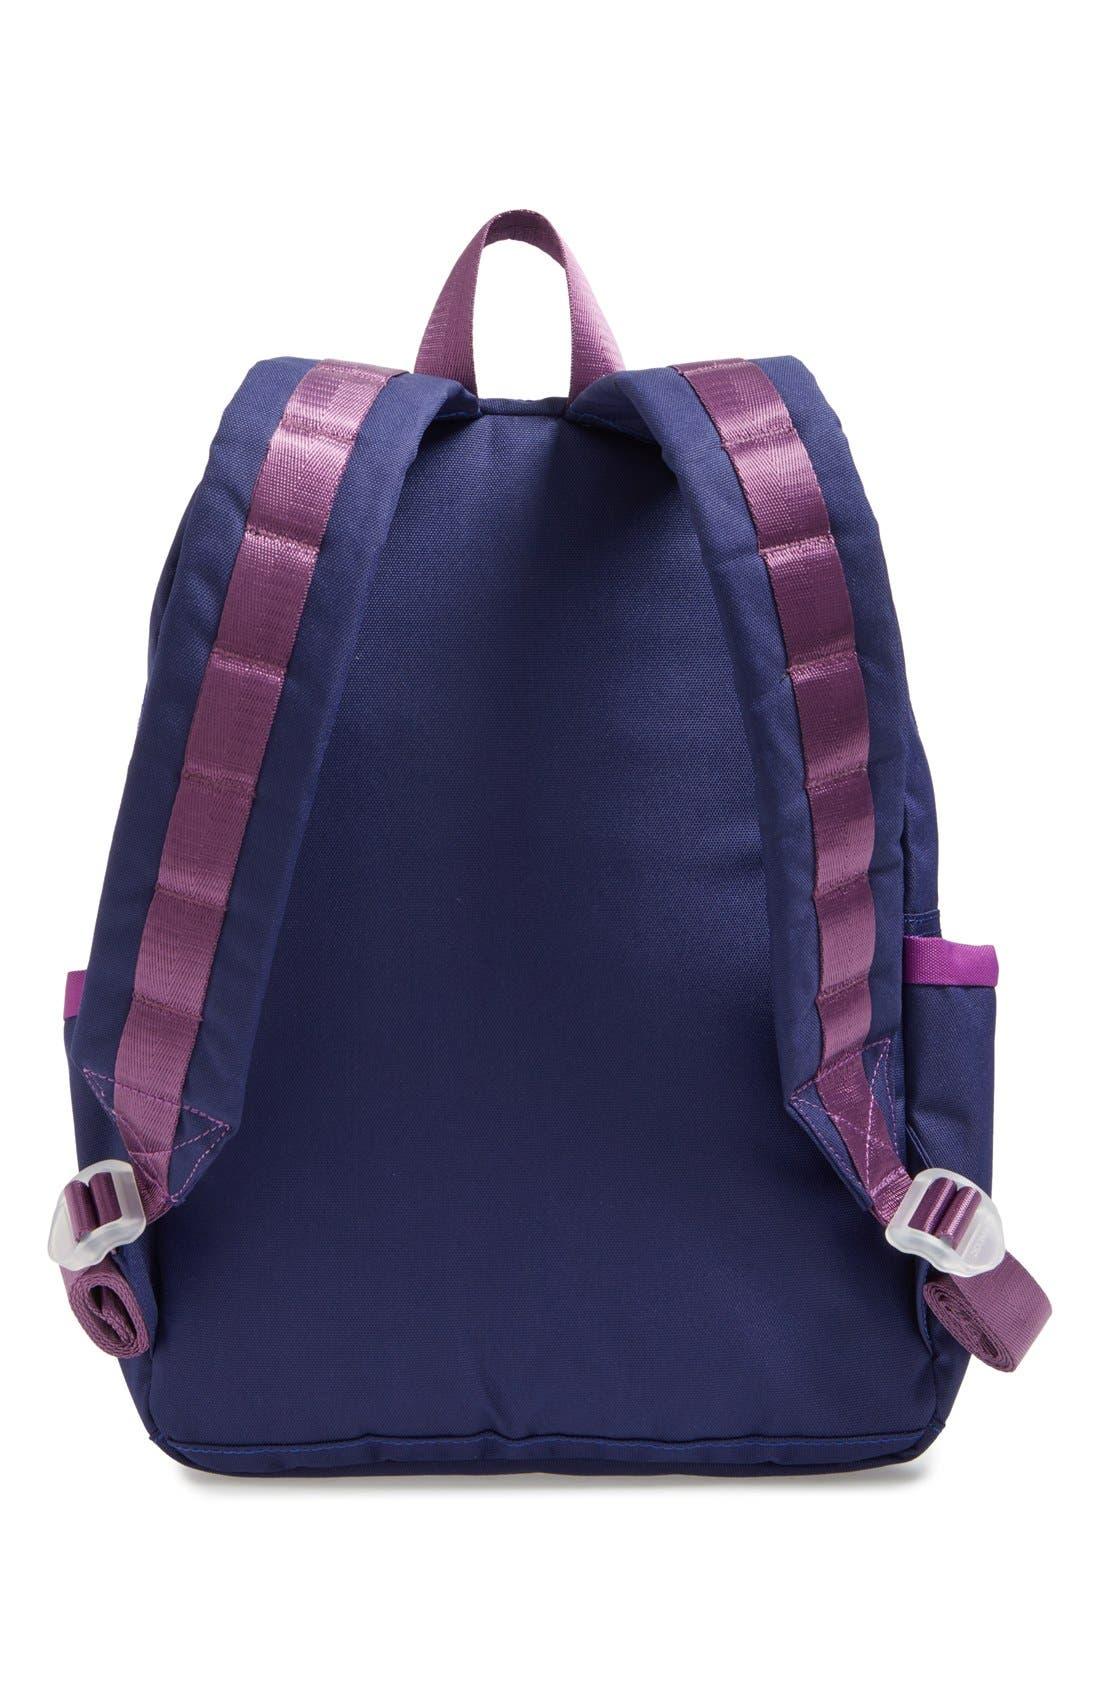 STATE BAGS,                             'Kane' Backpack,                             Alternate thumbnail 4, color,                             500